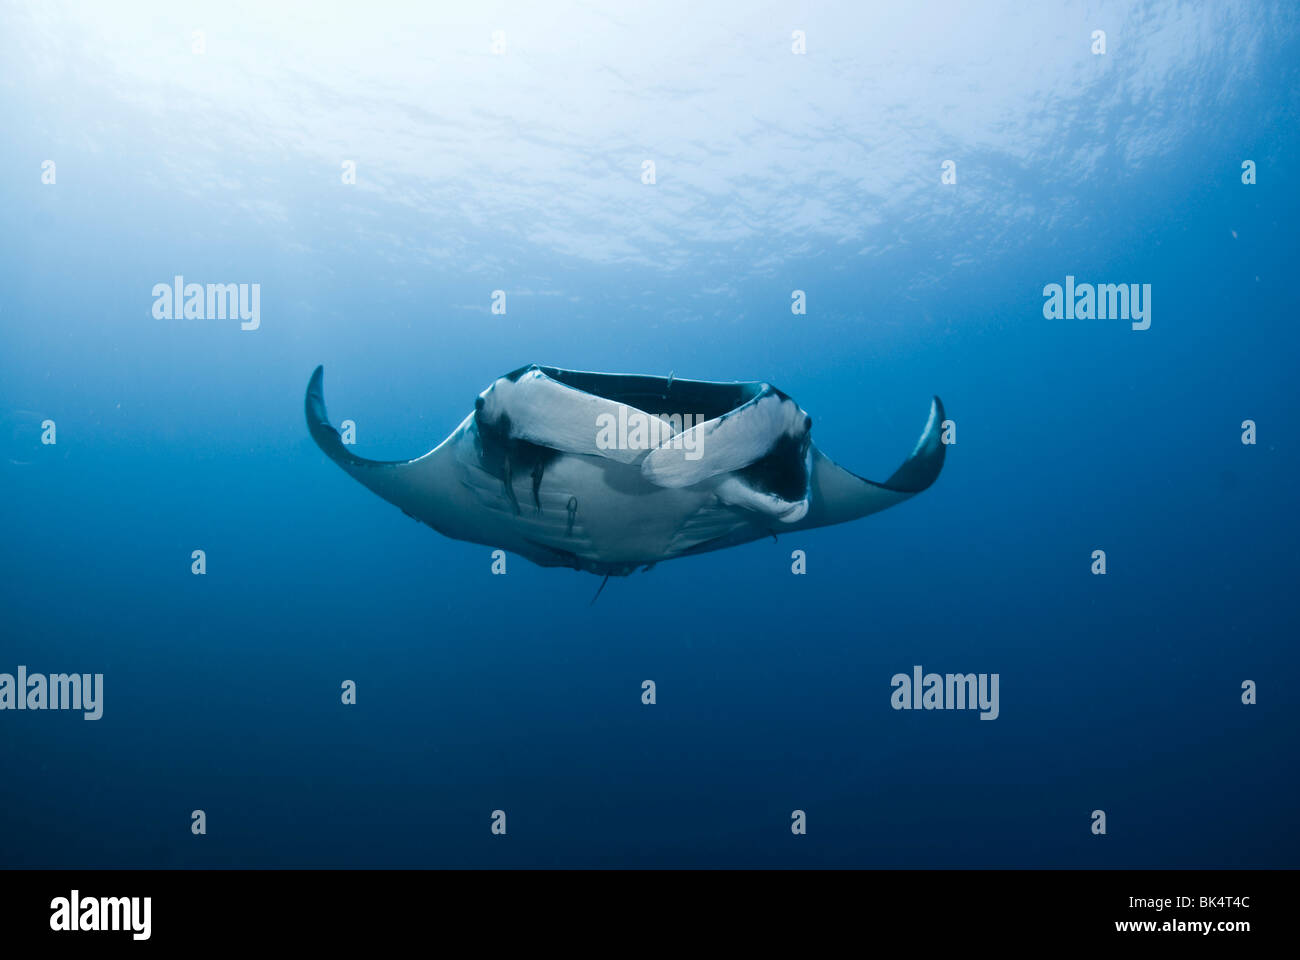 Manta ray, Mergui Archipelago, Burma, Andaman Sea, Indian Ocean Stock Photo